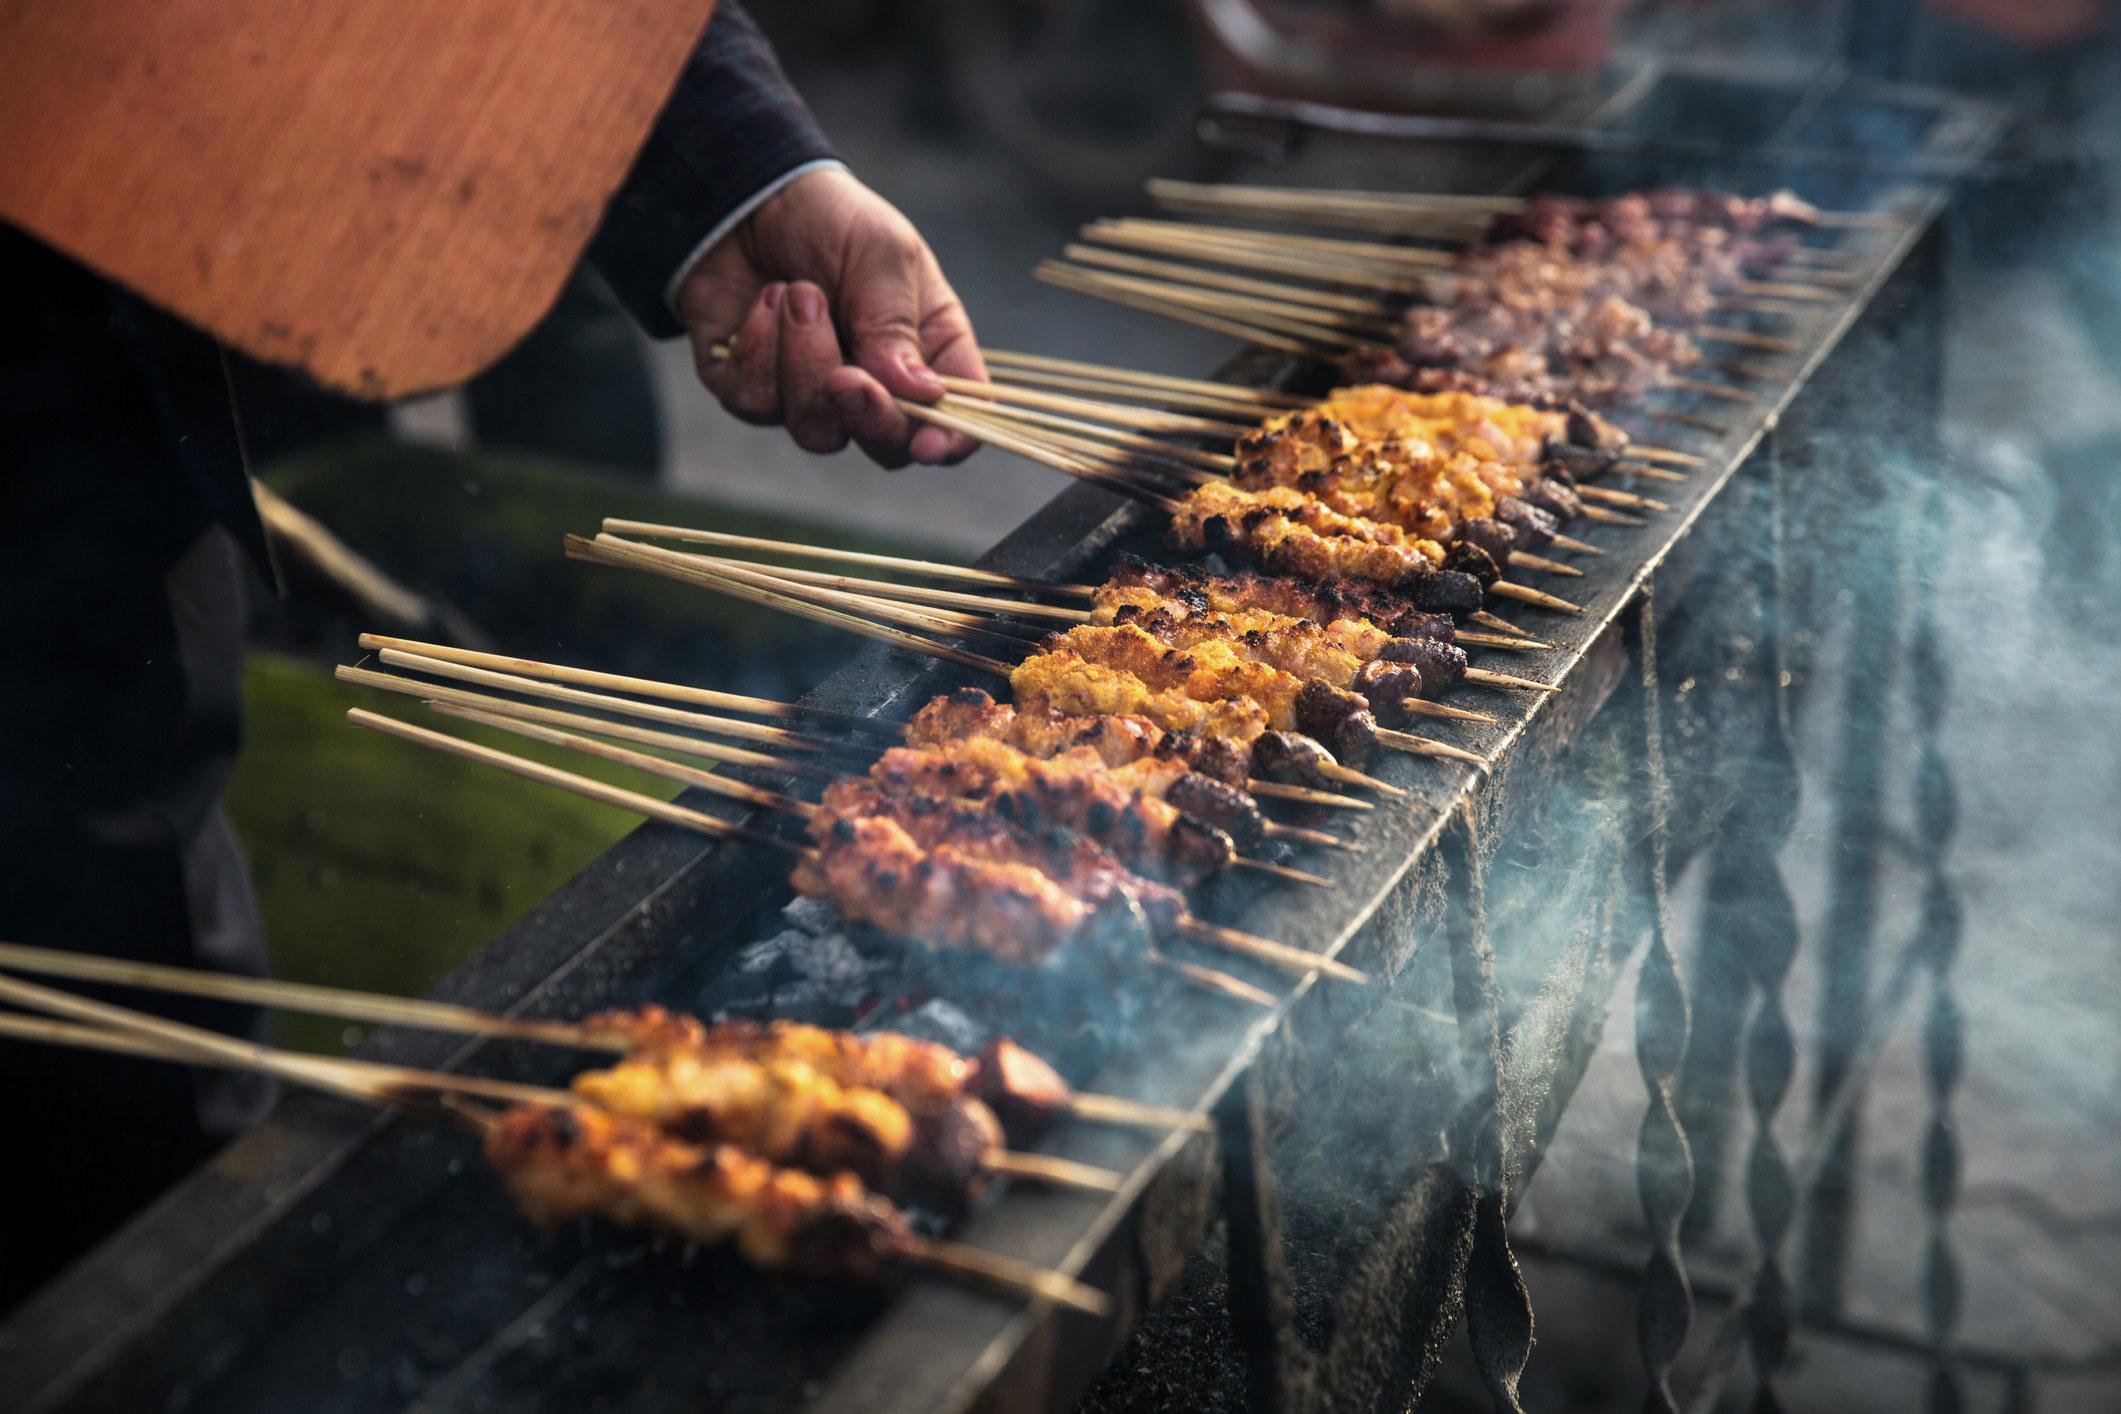 Meat being grilled on skewers.